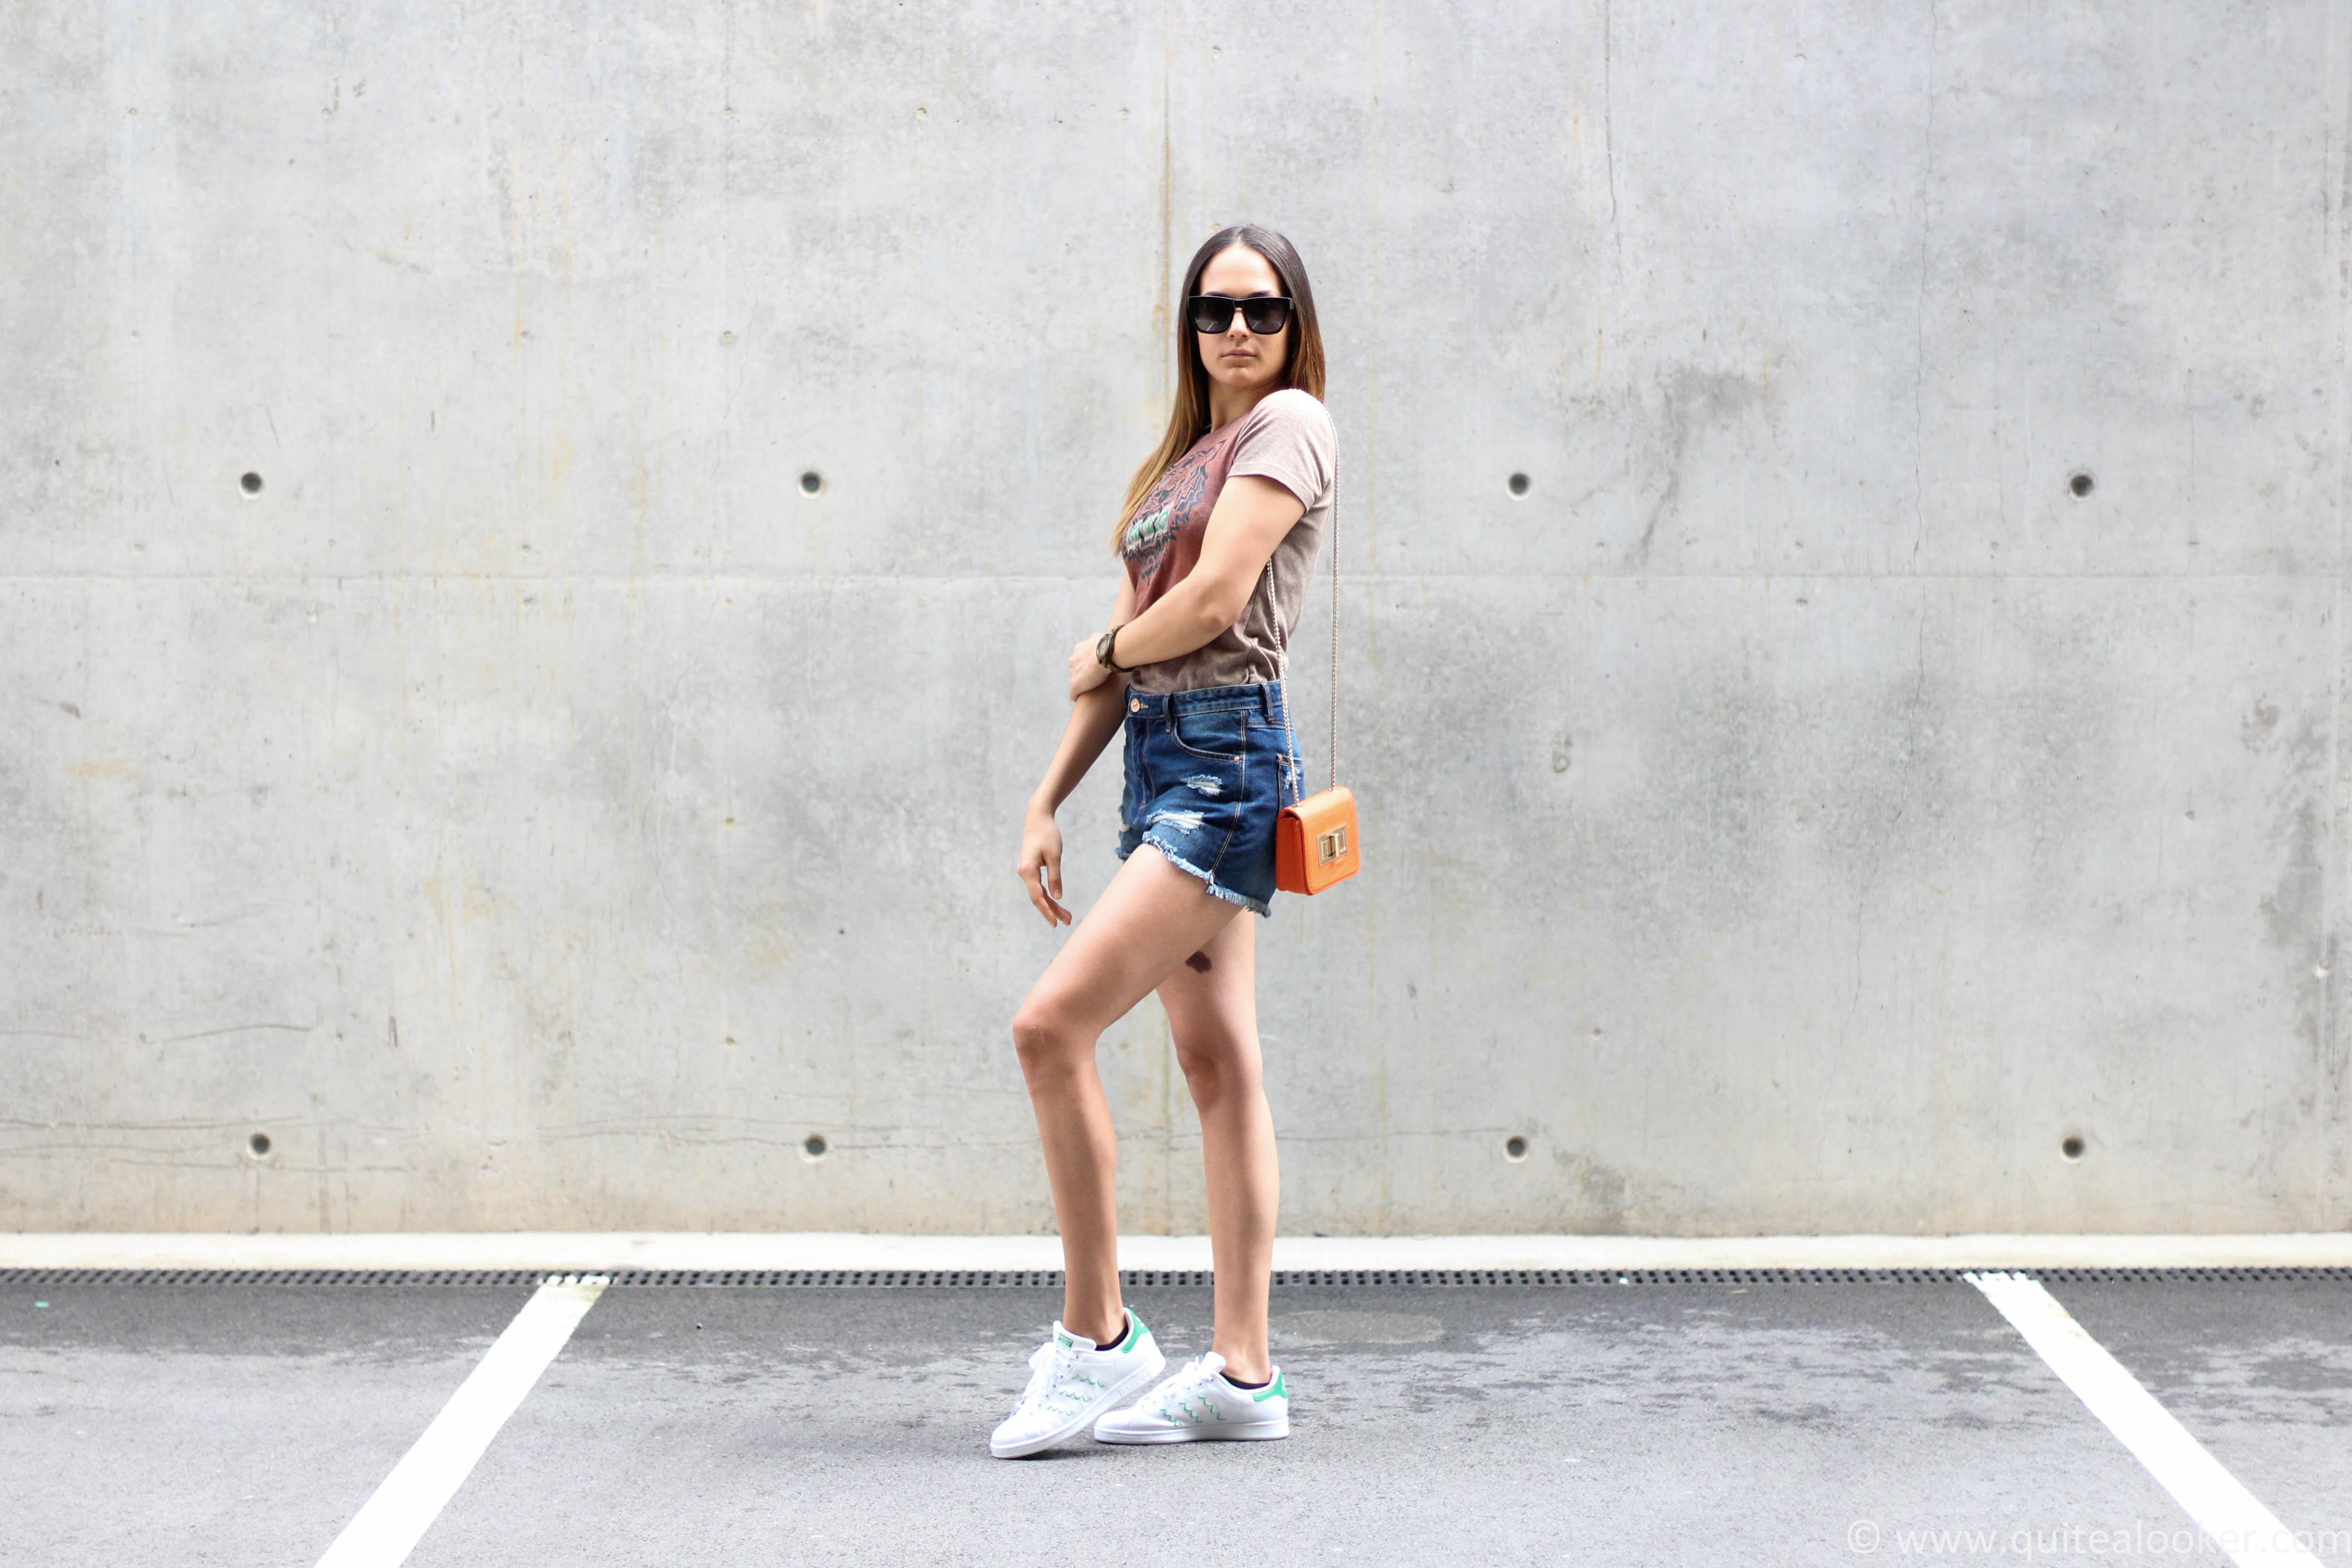 adidas stan smith zig zag sneakers summer outfit denim shorts stradivarius ss16 kenzo tshirt polette sunglasses bulgarian fashion blogger michaella quite a looker www.quitealooker.com